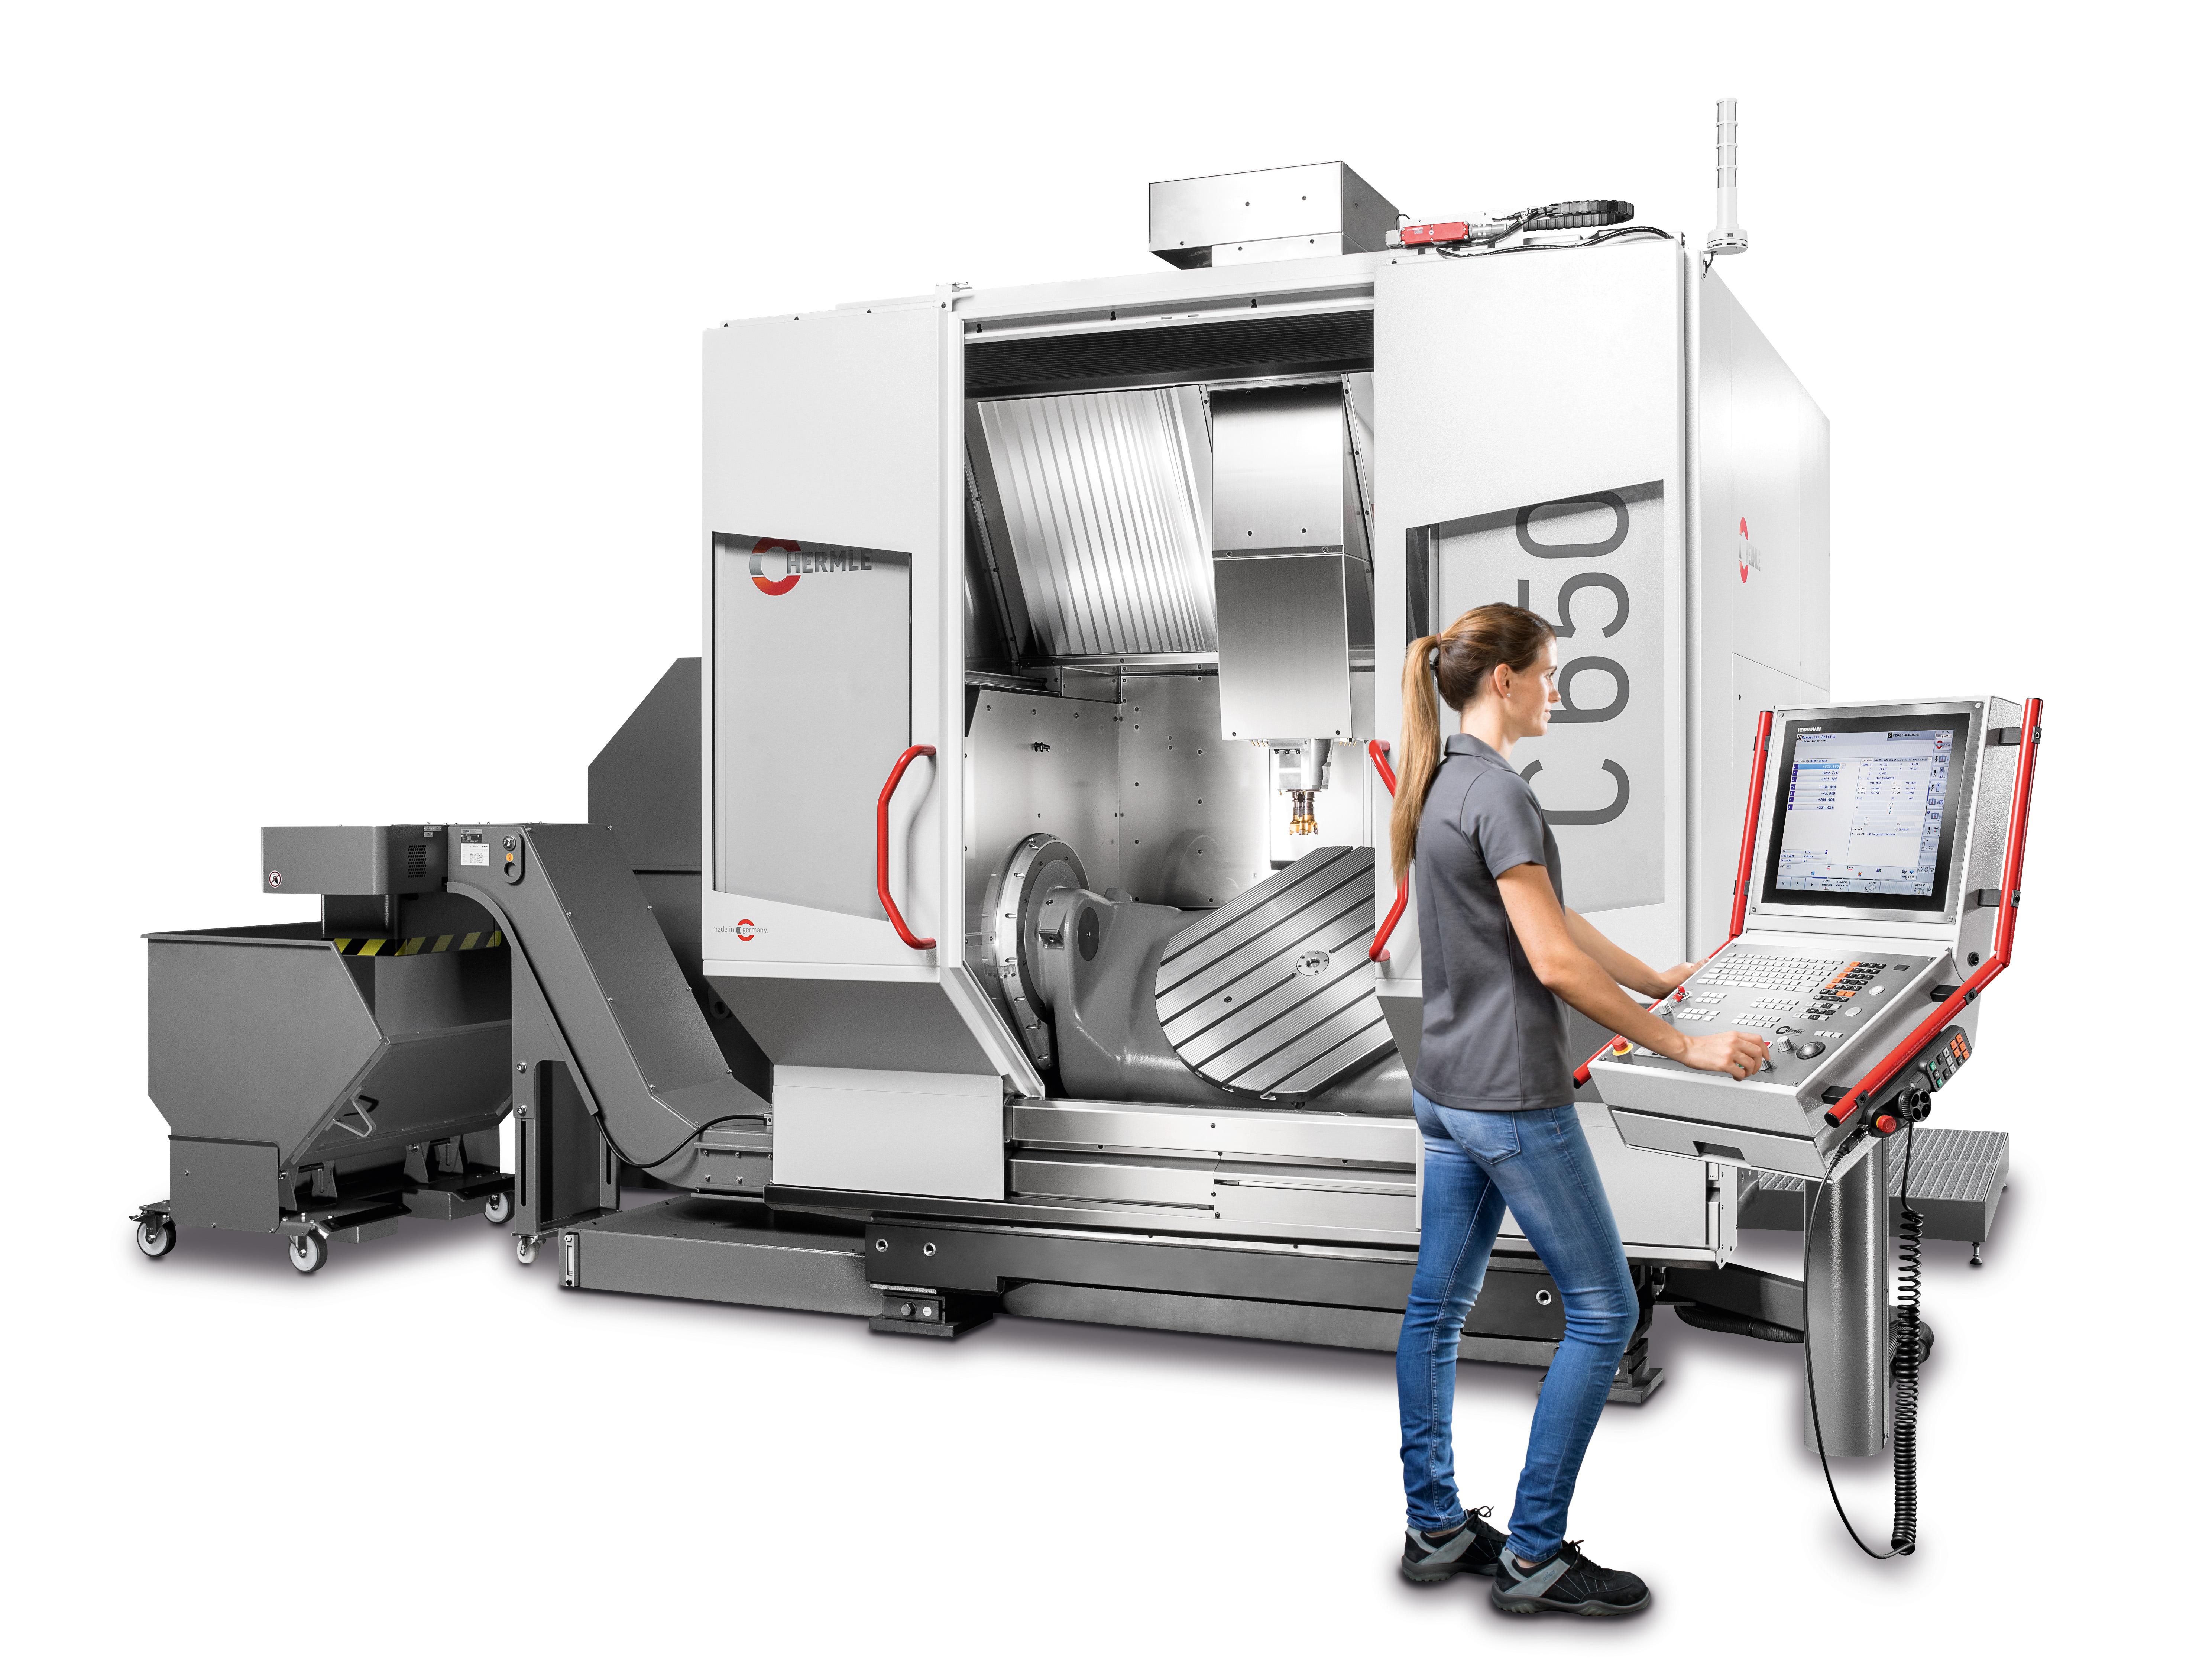 New machine model C 650